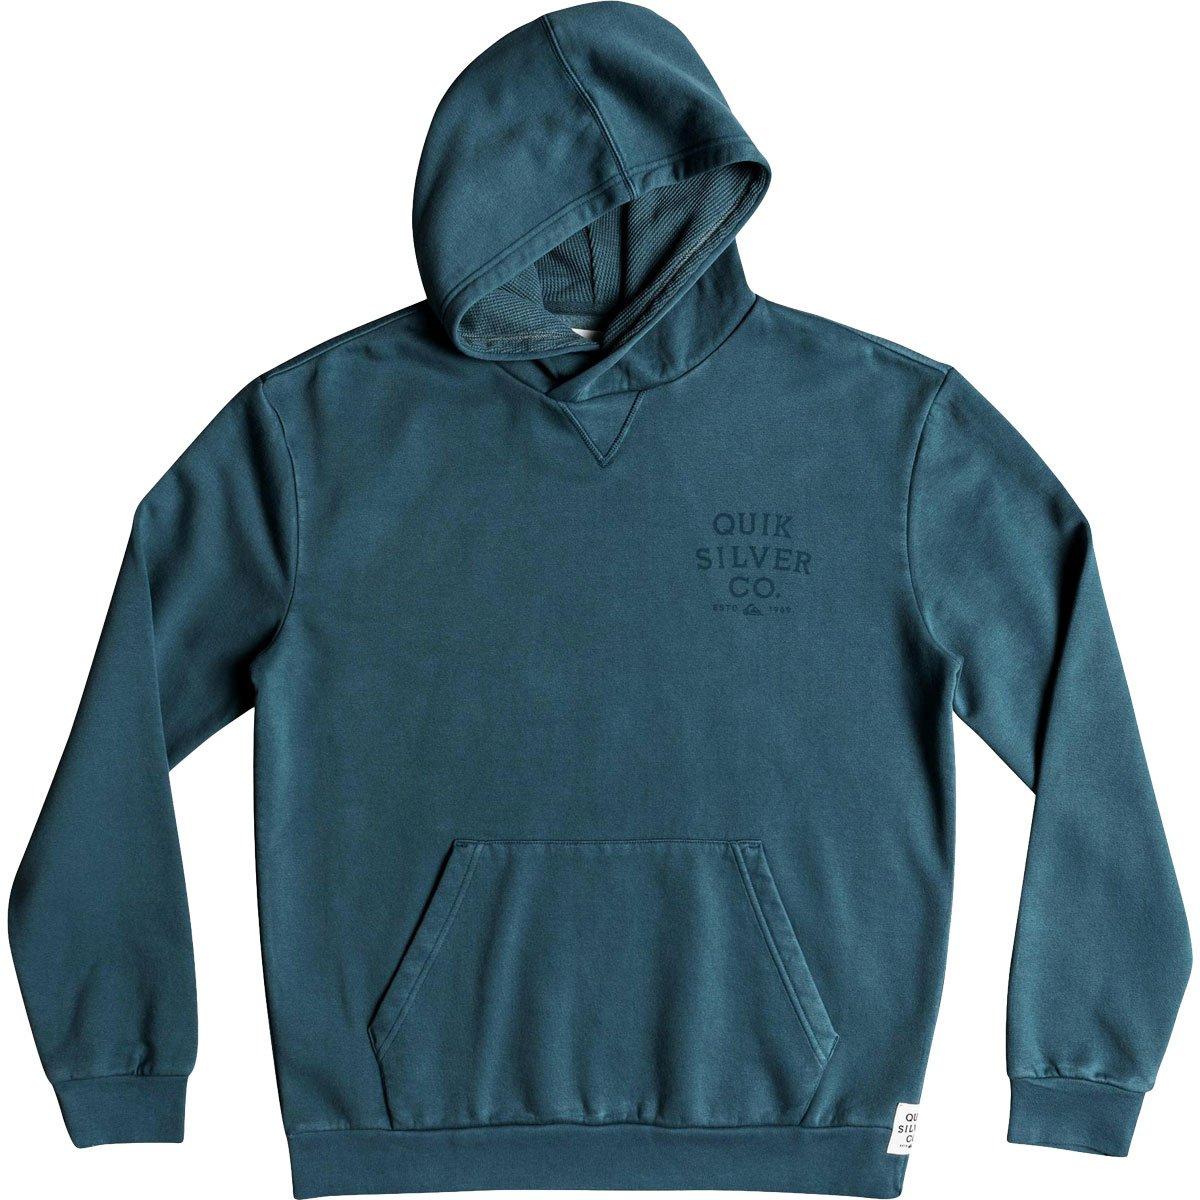 Quiksilver Men's ASO Plains Fleec Hooded Jacket, Tapestry, M